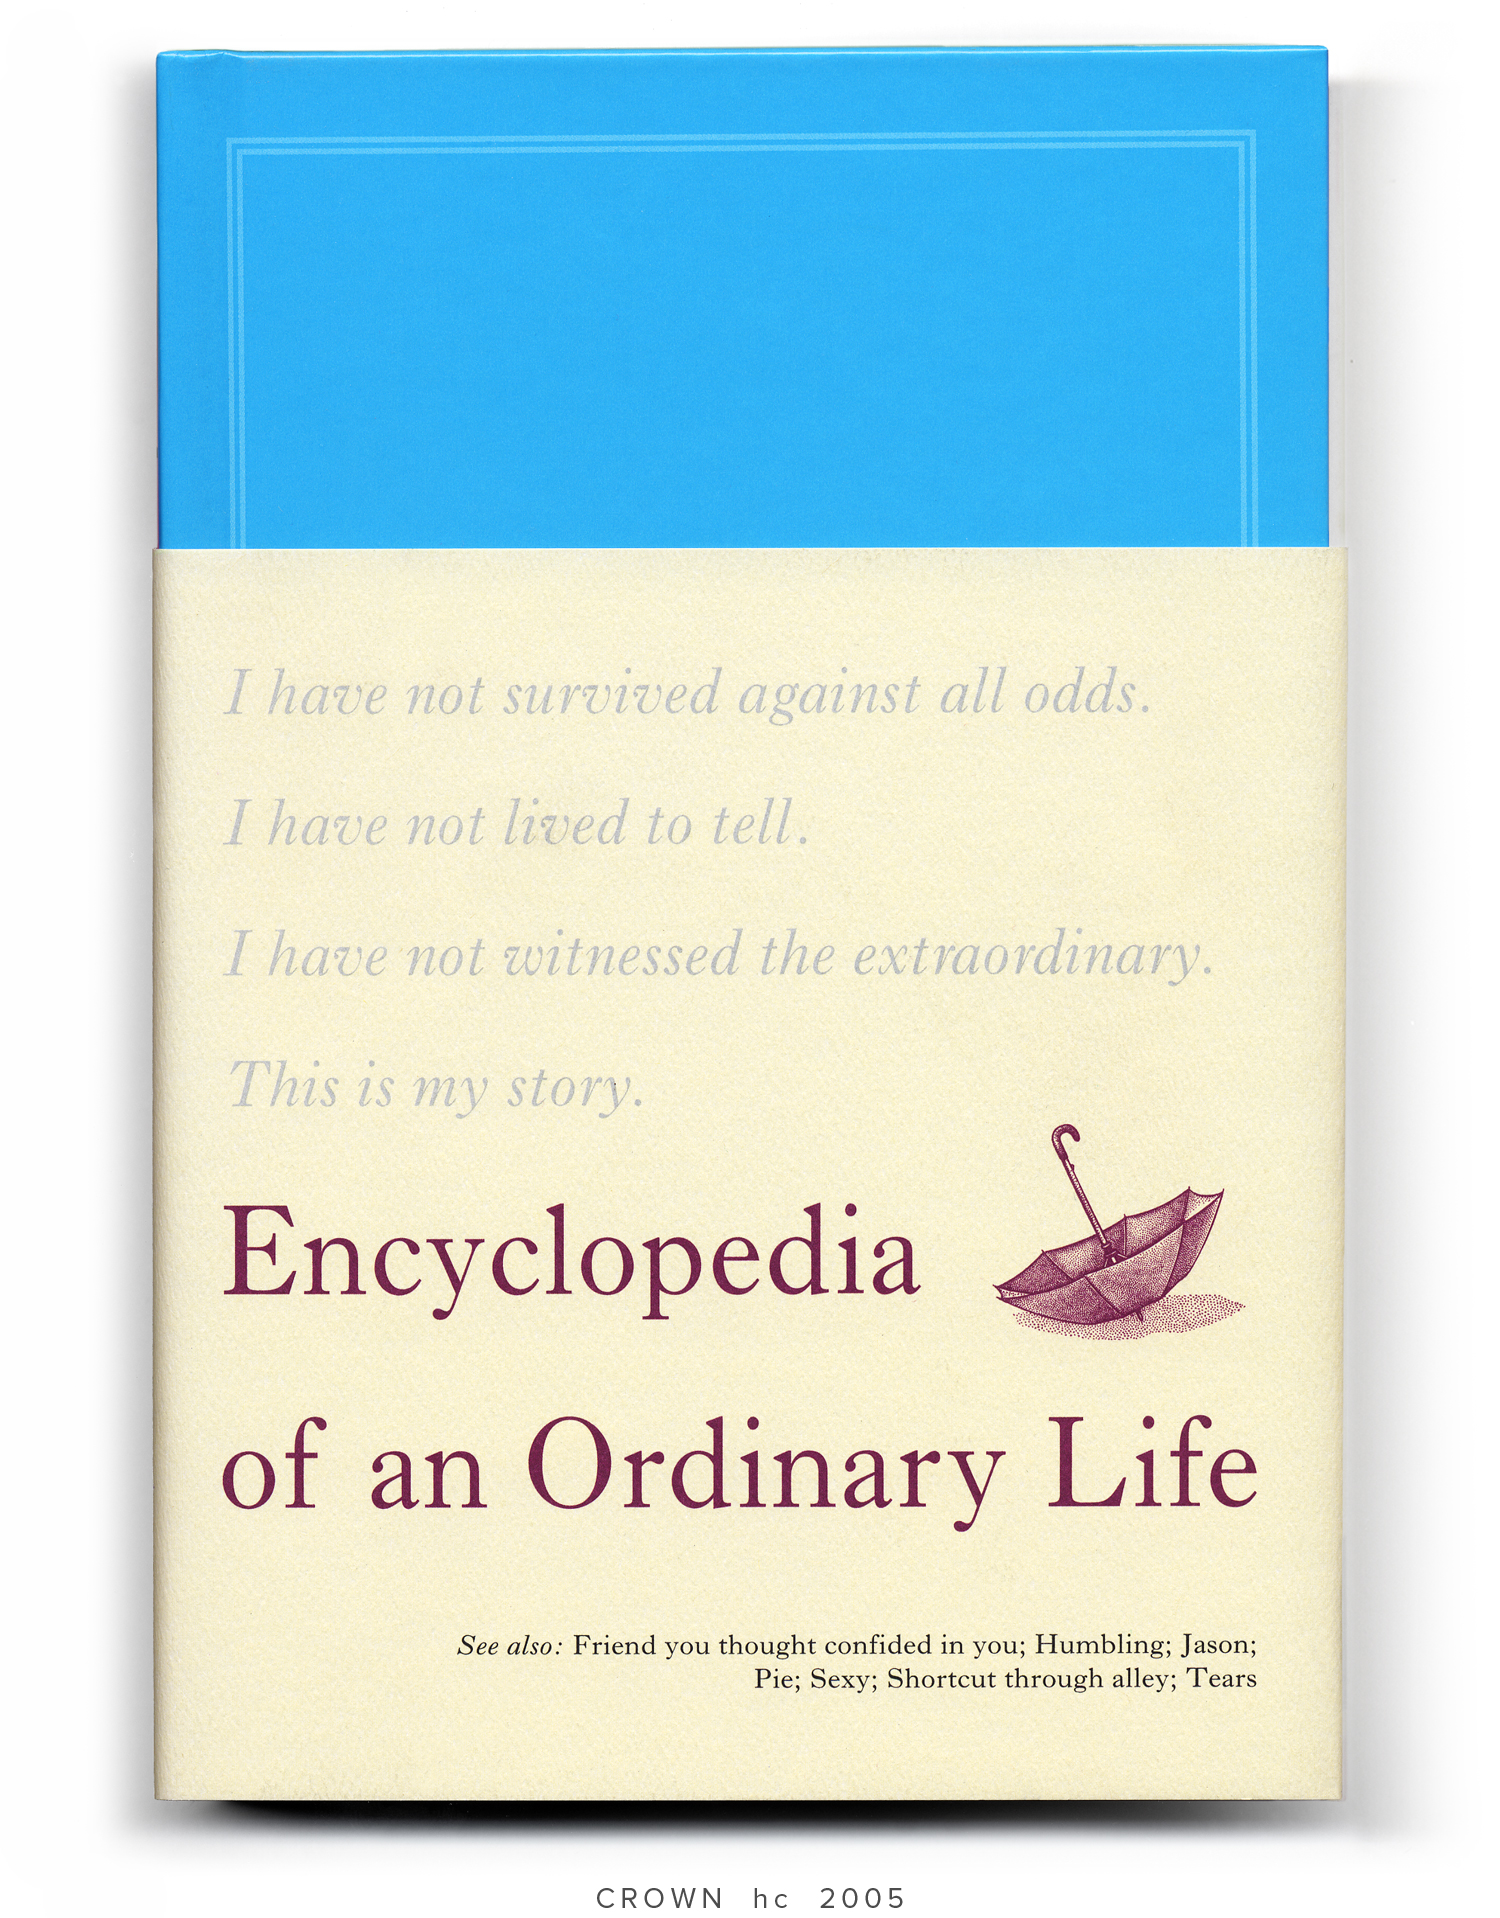 ENCYCLOPEDIA-OF-AN-ORDINARY-LIFE-hc-ss6.jpg